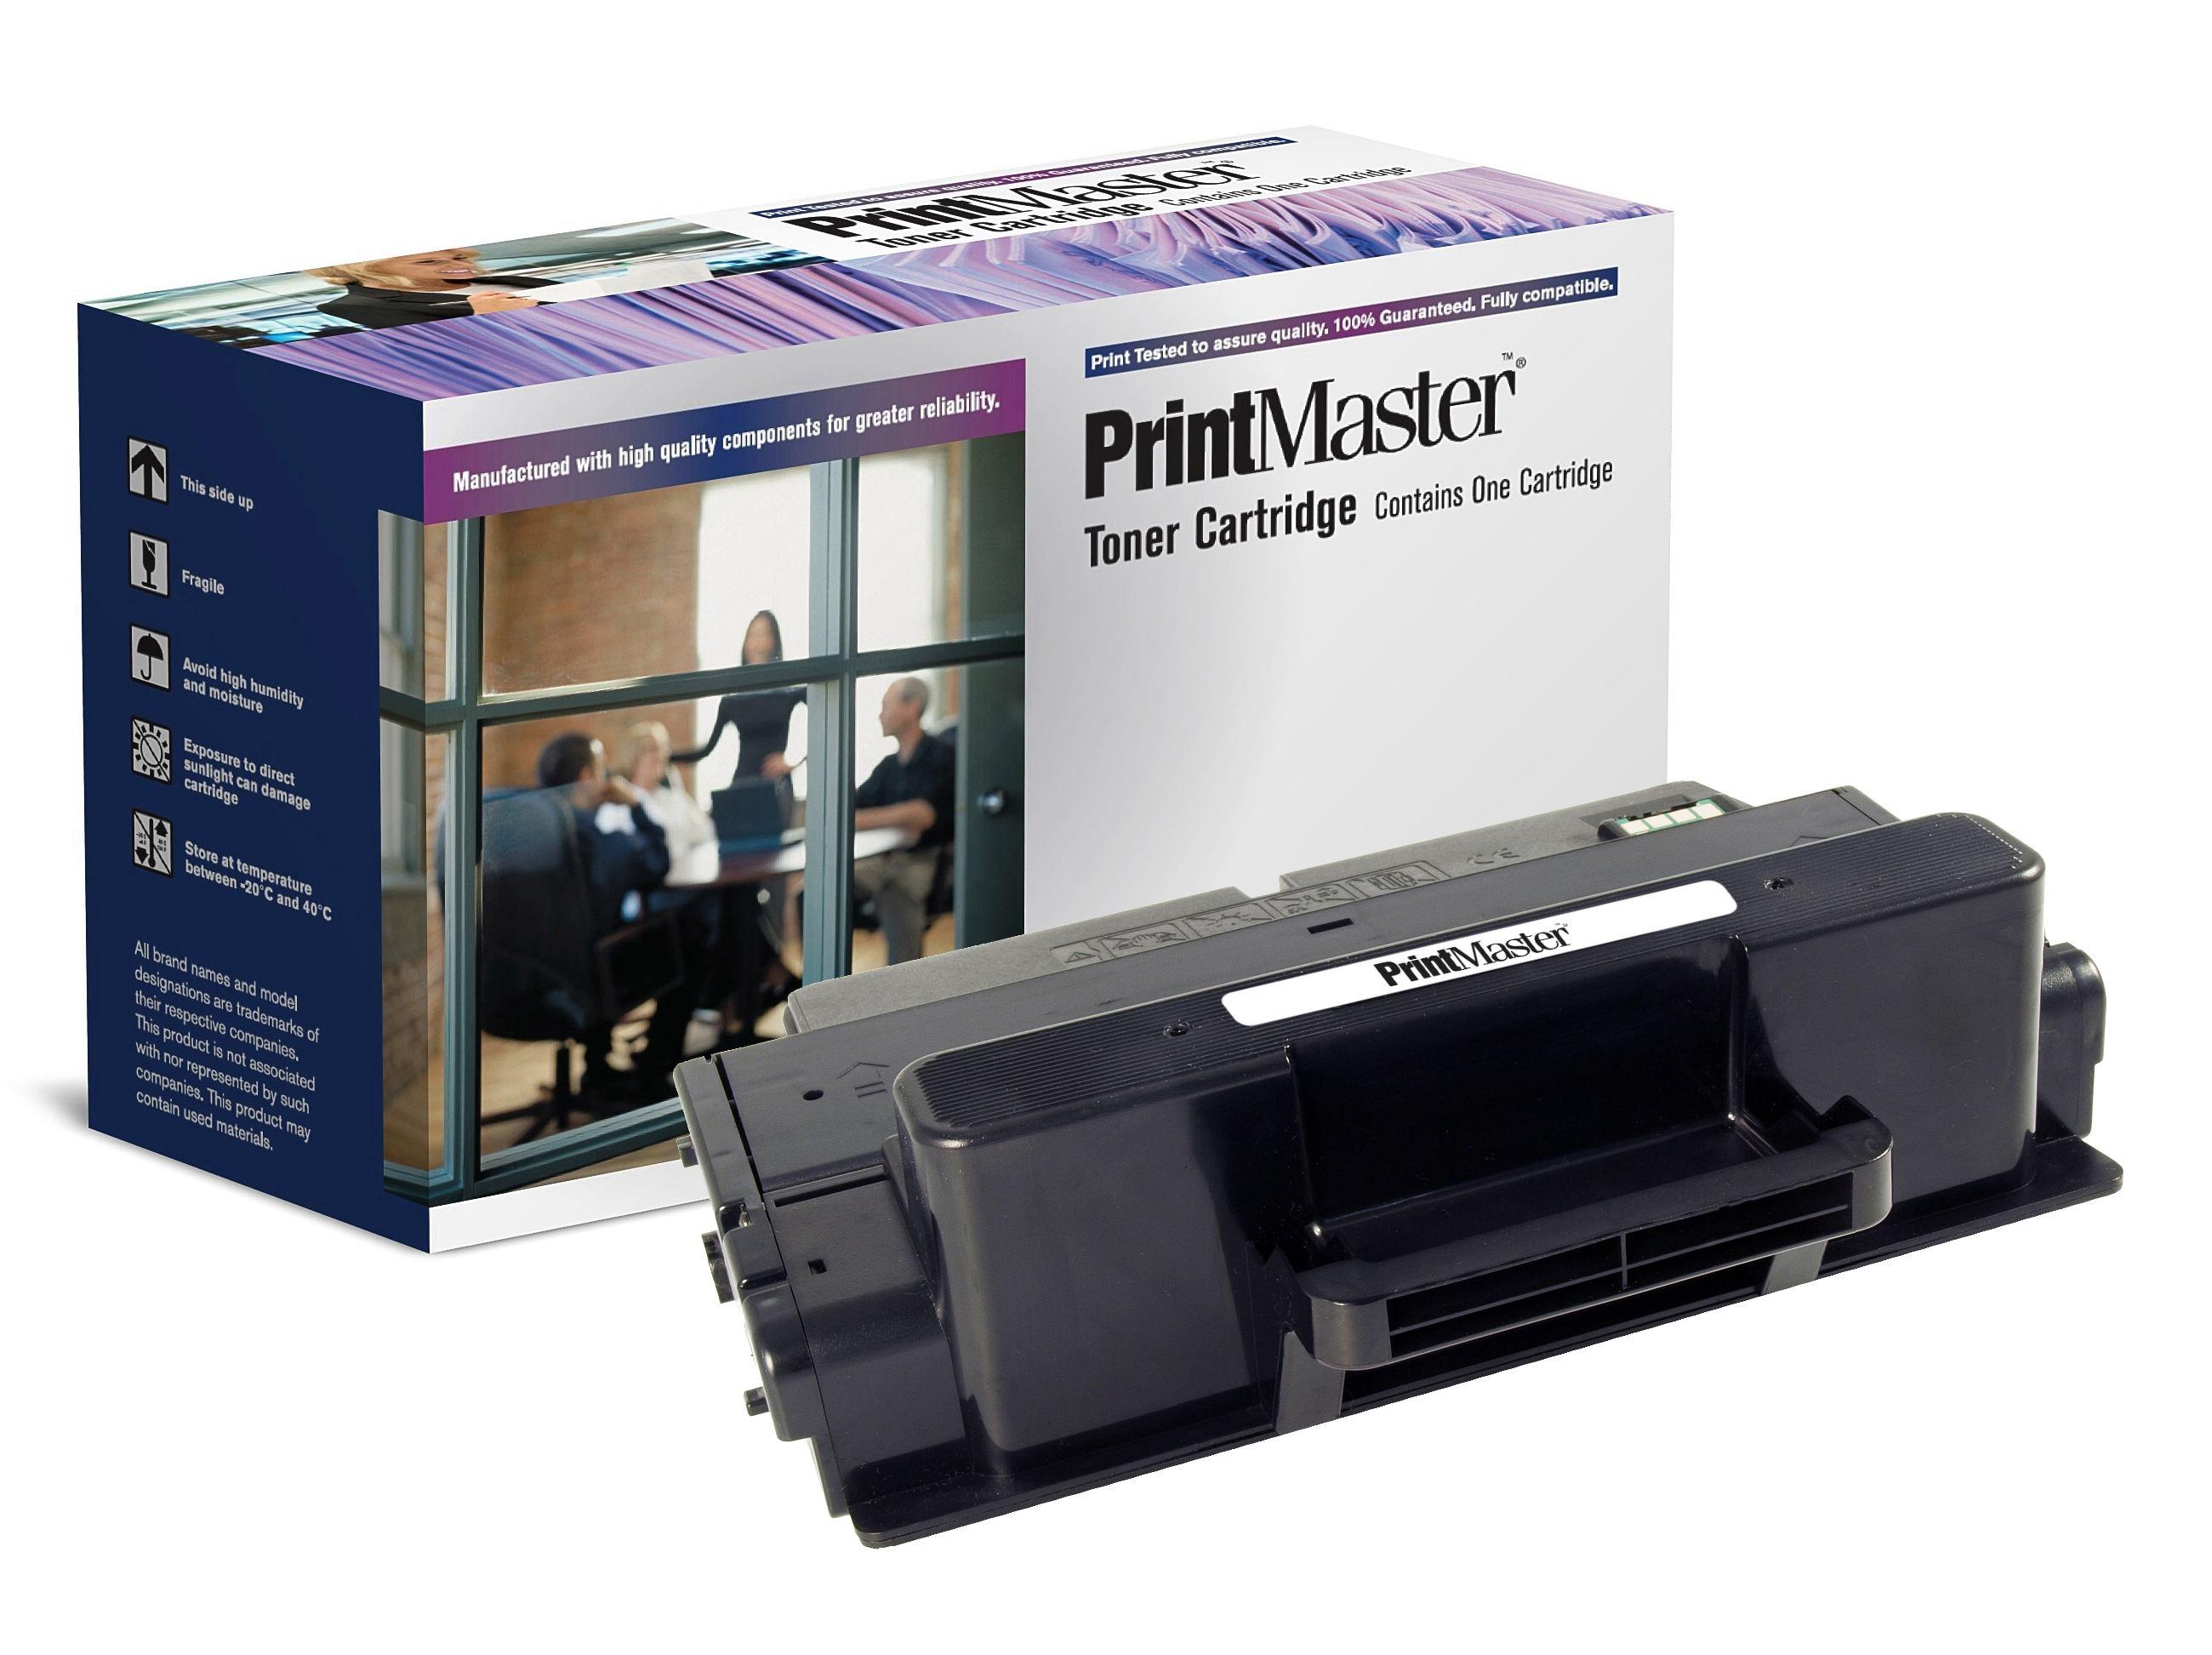 PrintMaster SCX5637/5737/ML3710 Bk 10K